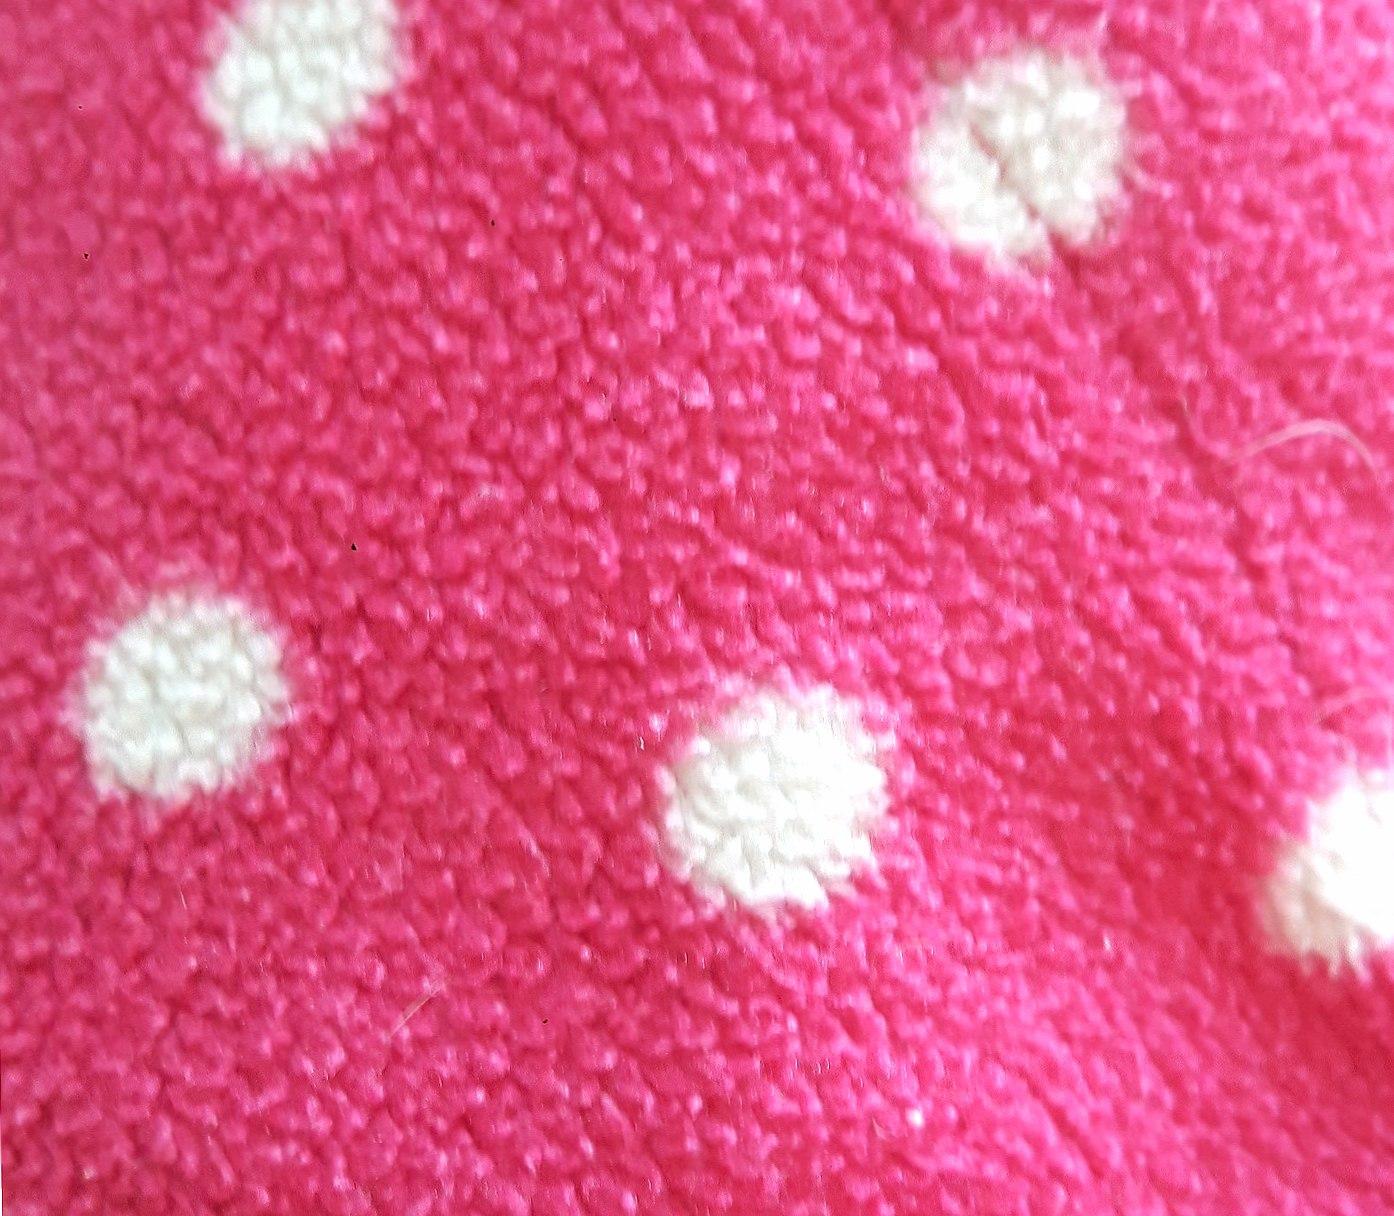 Pink polka dot wallpapers HD quality